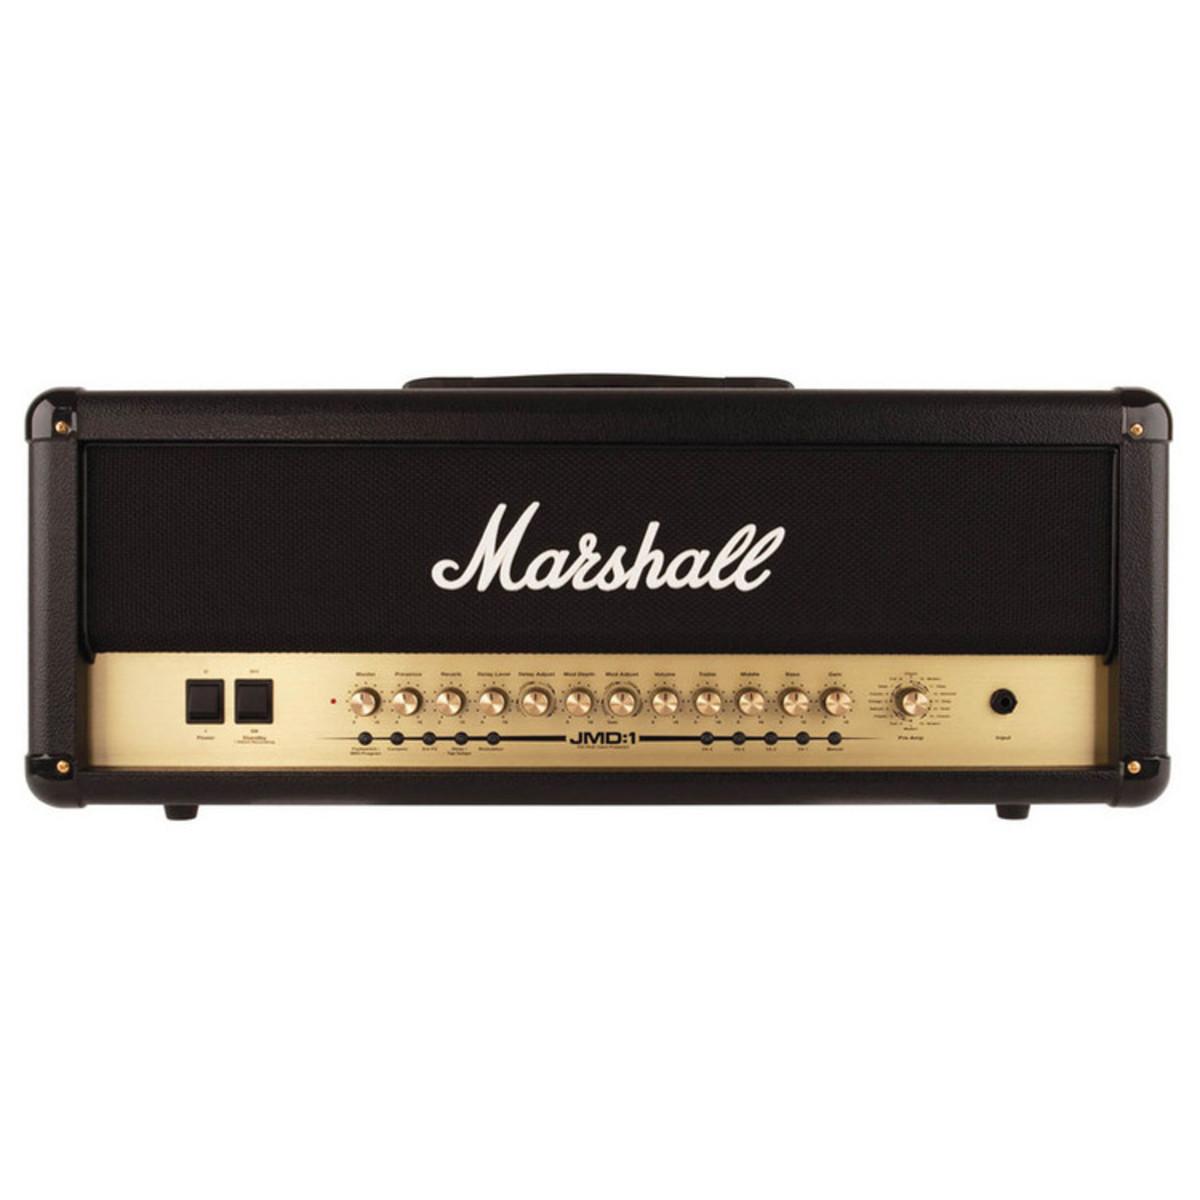 tete d 39 ampli guitare valve disque marshall jmd100 100w. Black Bedroom Furniture Sets. Home Design Ideas